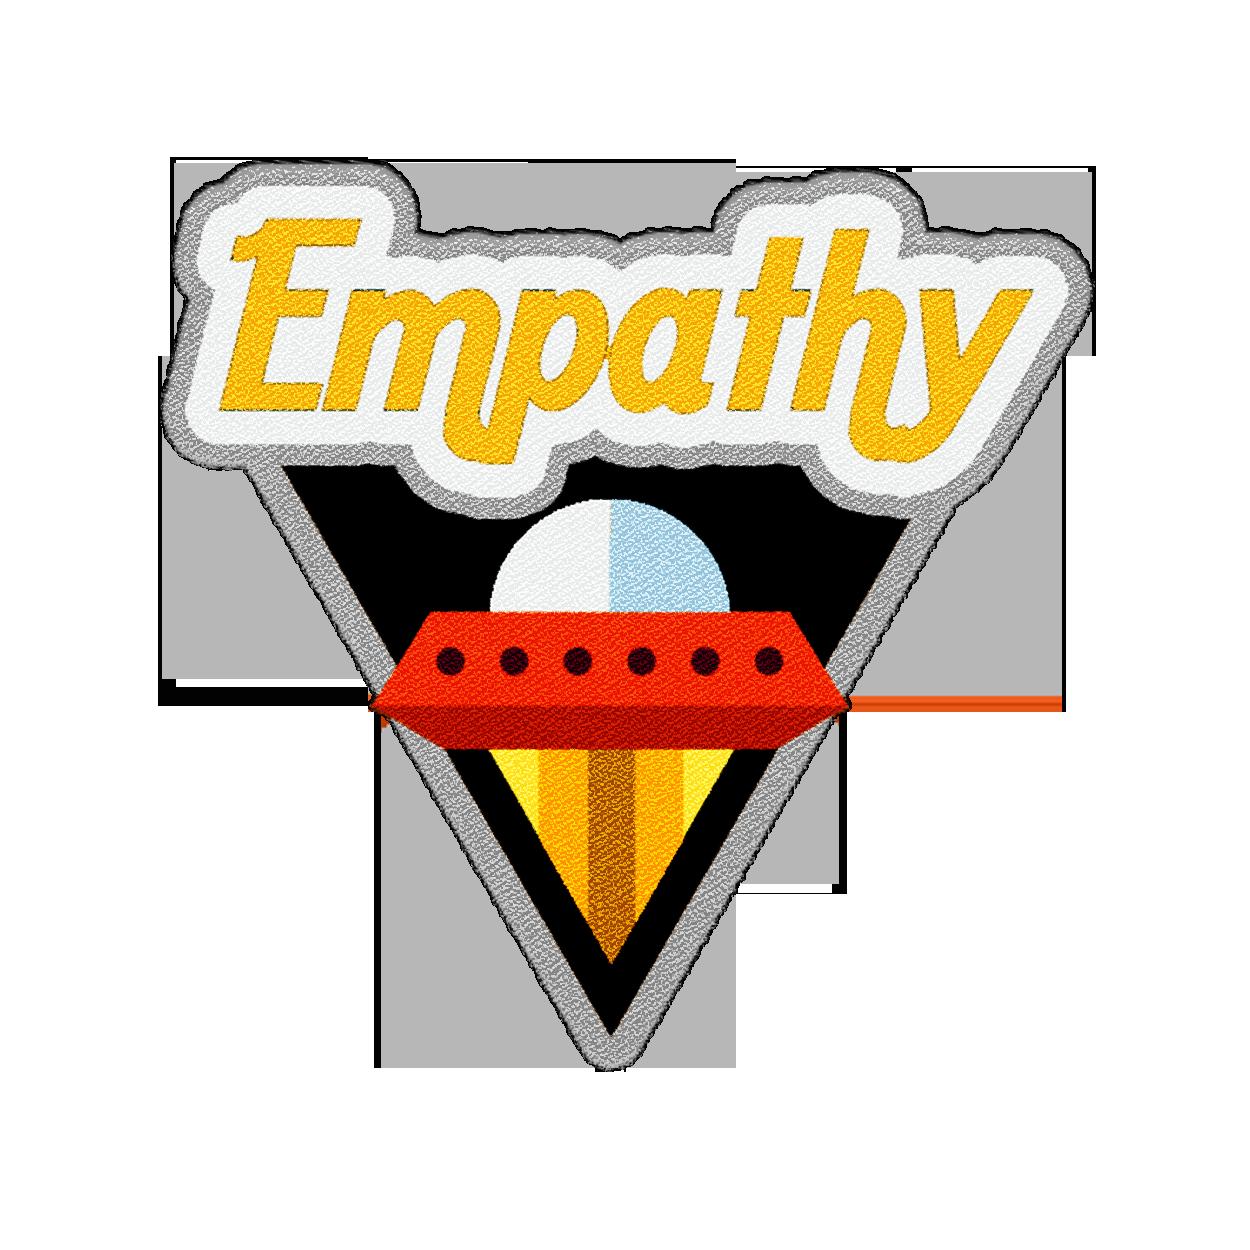 05 - Empathy.png